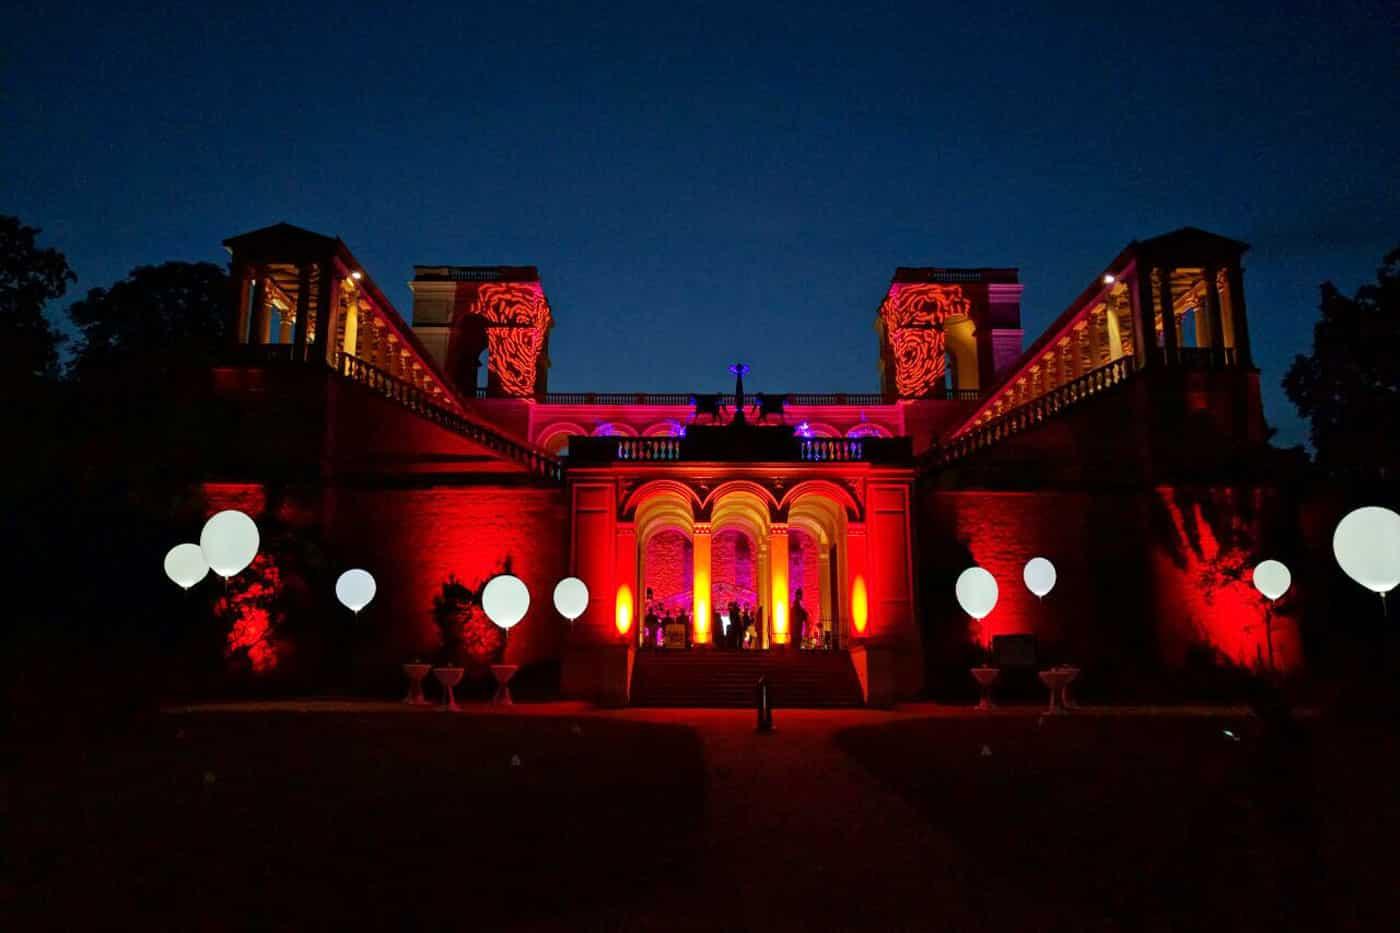 Leuchtballons 80 cm aufgereiht vor Schloss Belvedere Potsdam